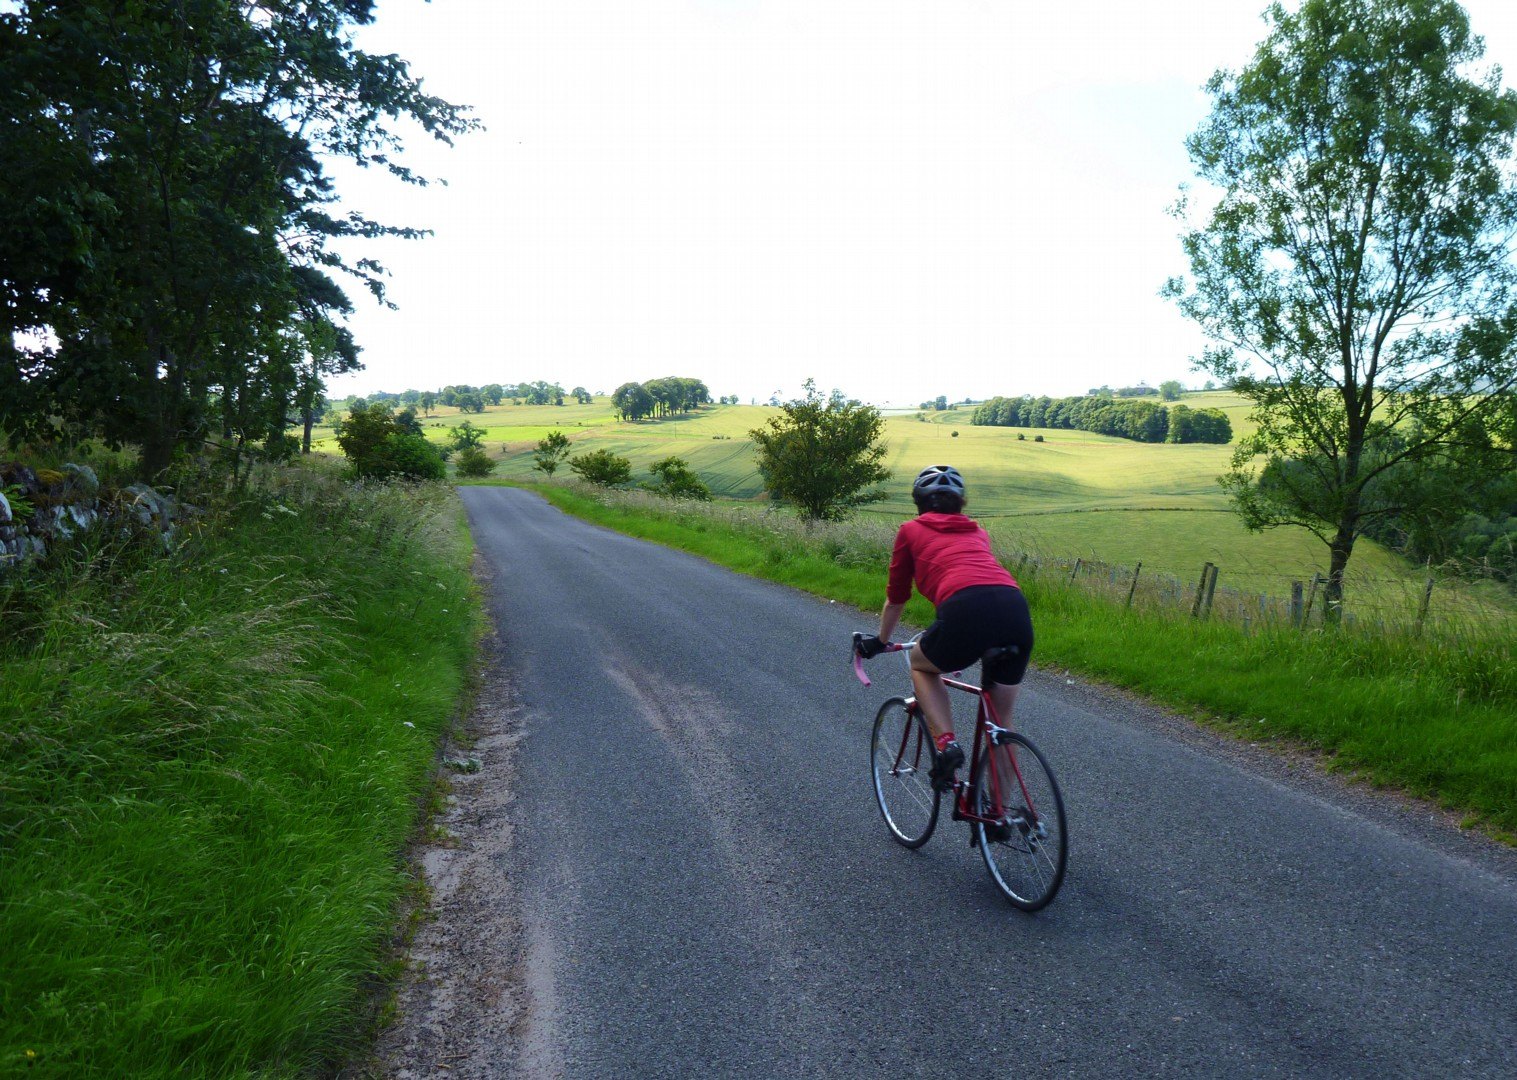 uk-cycling-weekend-northumberland.jpg - UK - Northumberland - Road Cycling